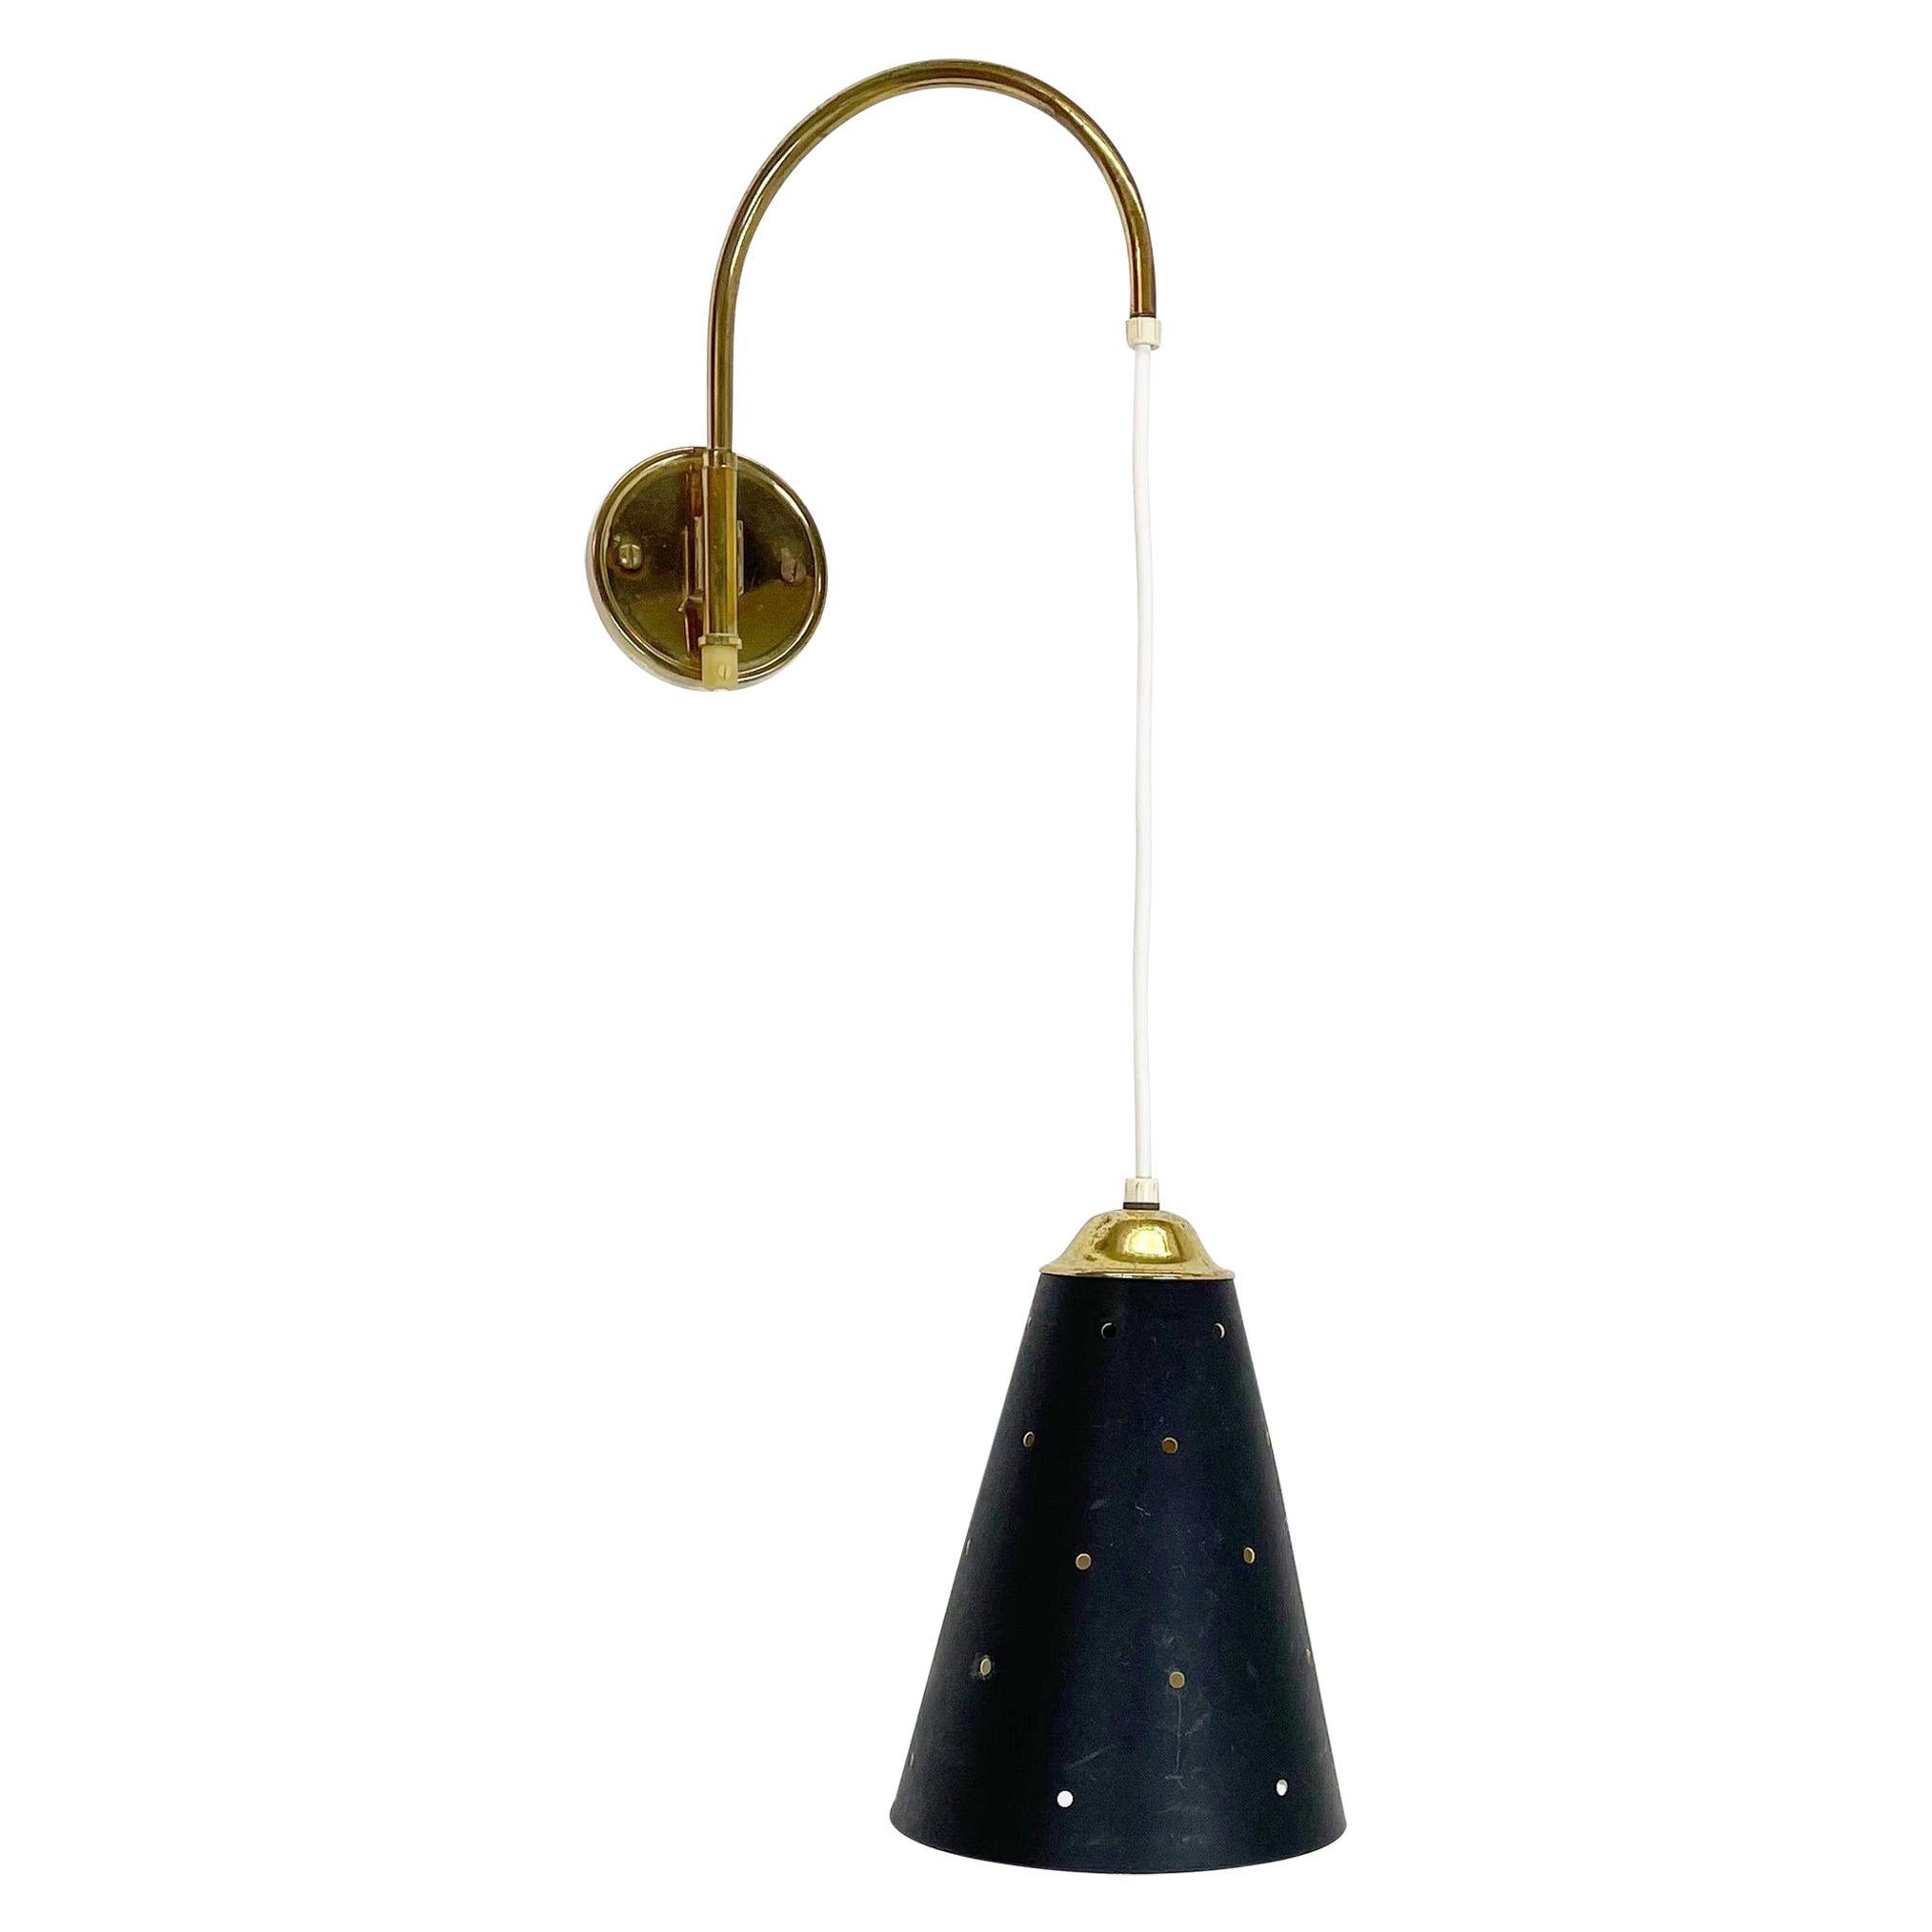 Minimalist Stilnovo Style Adjustable Brass Wall Hanging Light, Italy 1960s